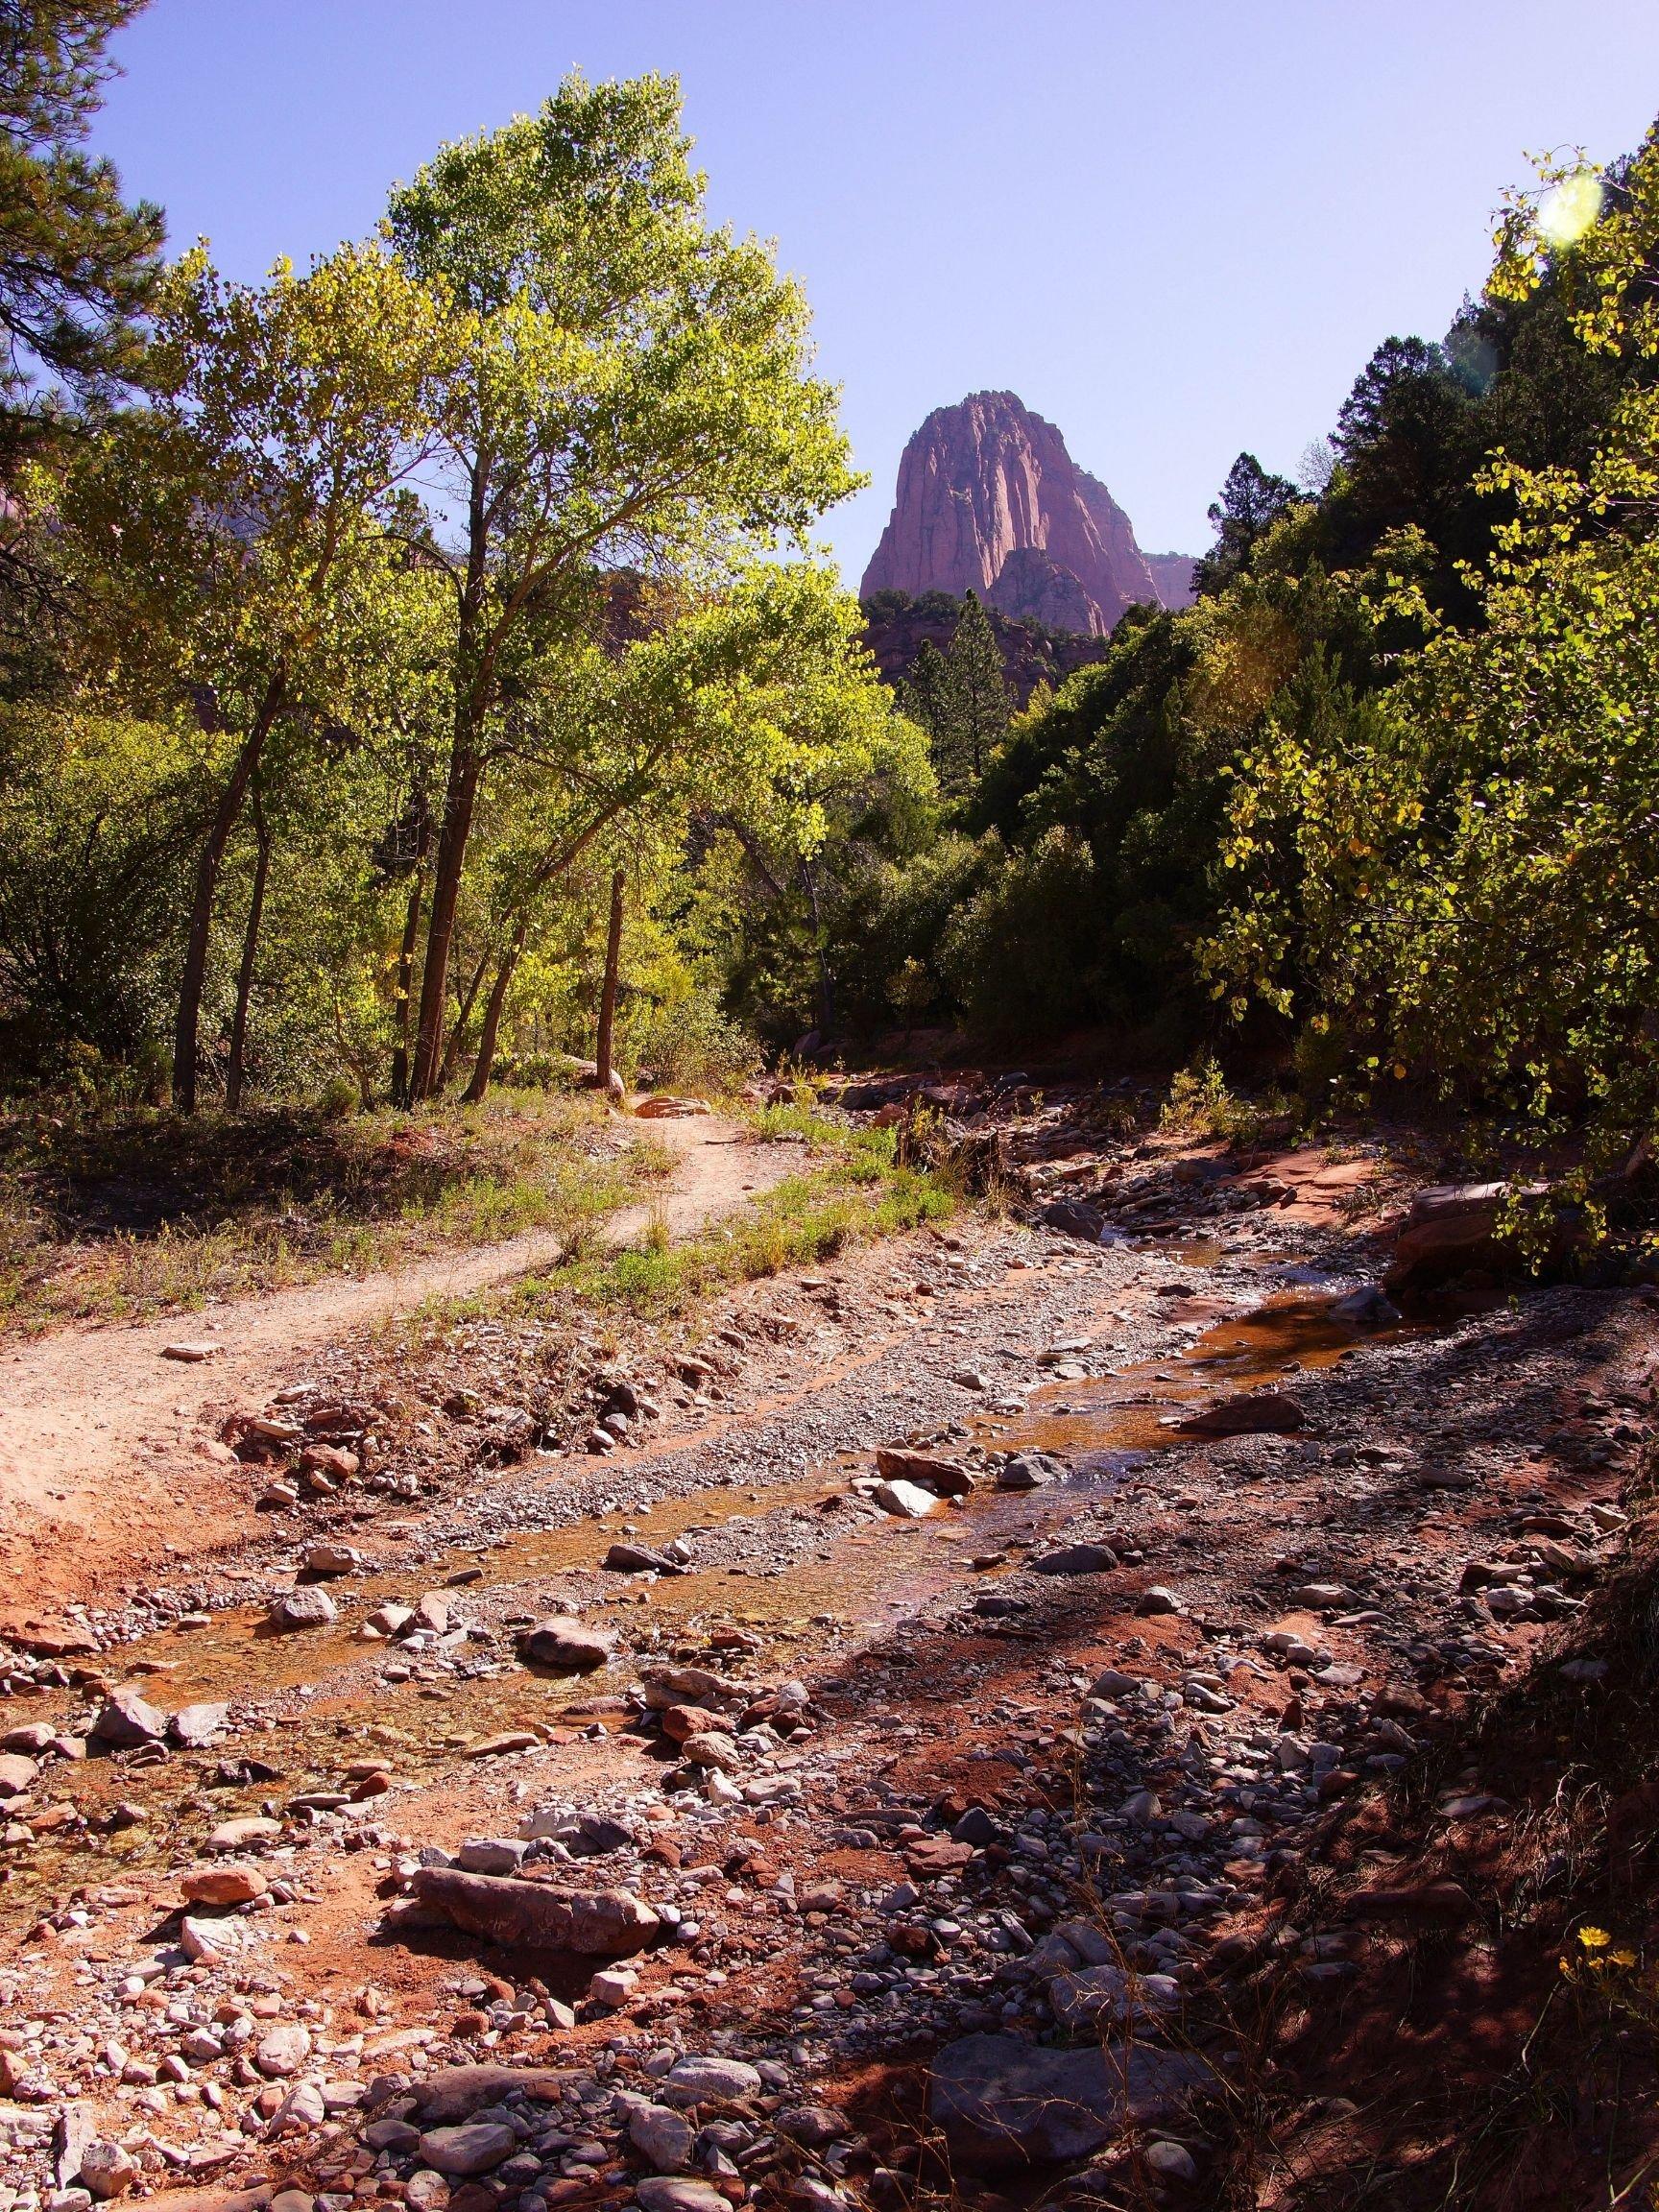 Taylor Lake Creek Trail Hike in Zion